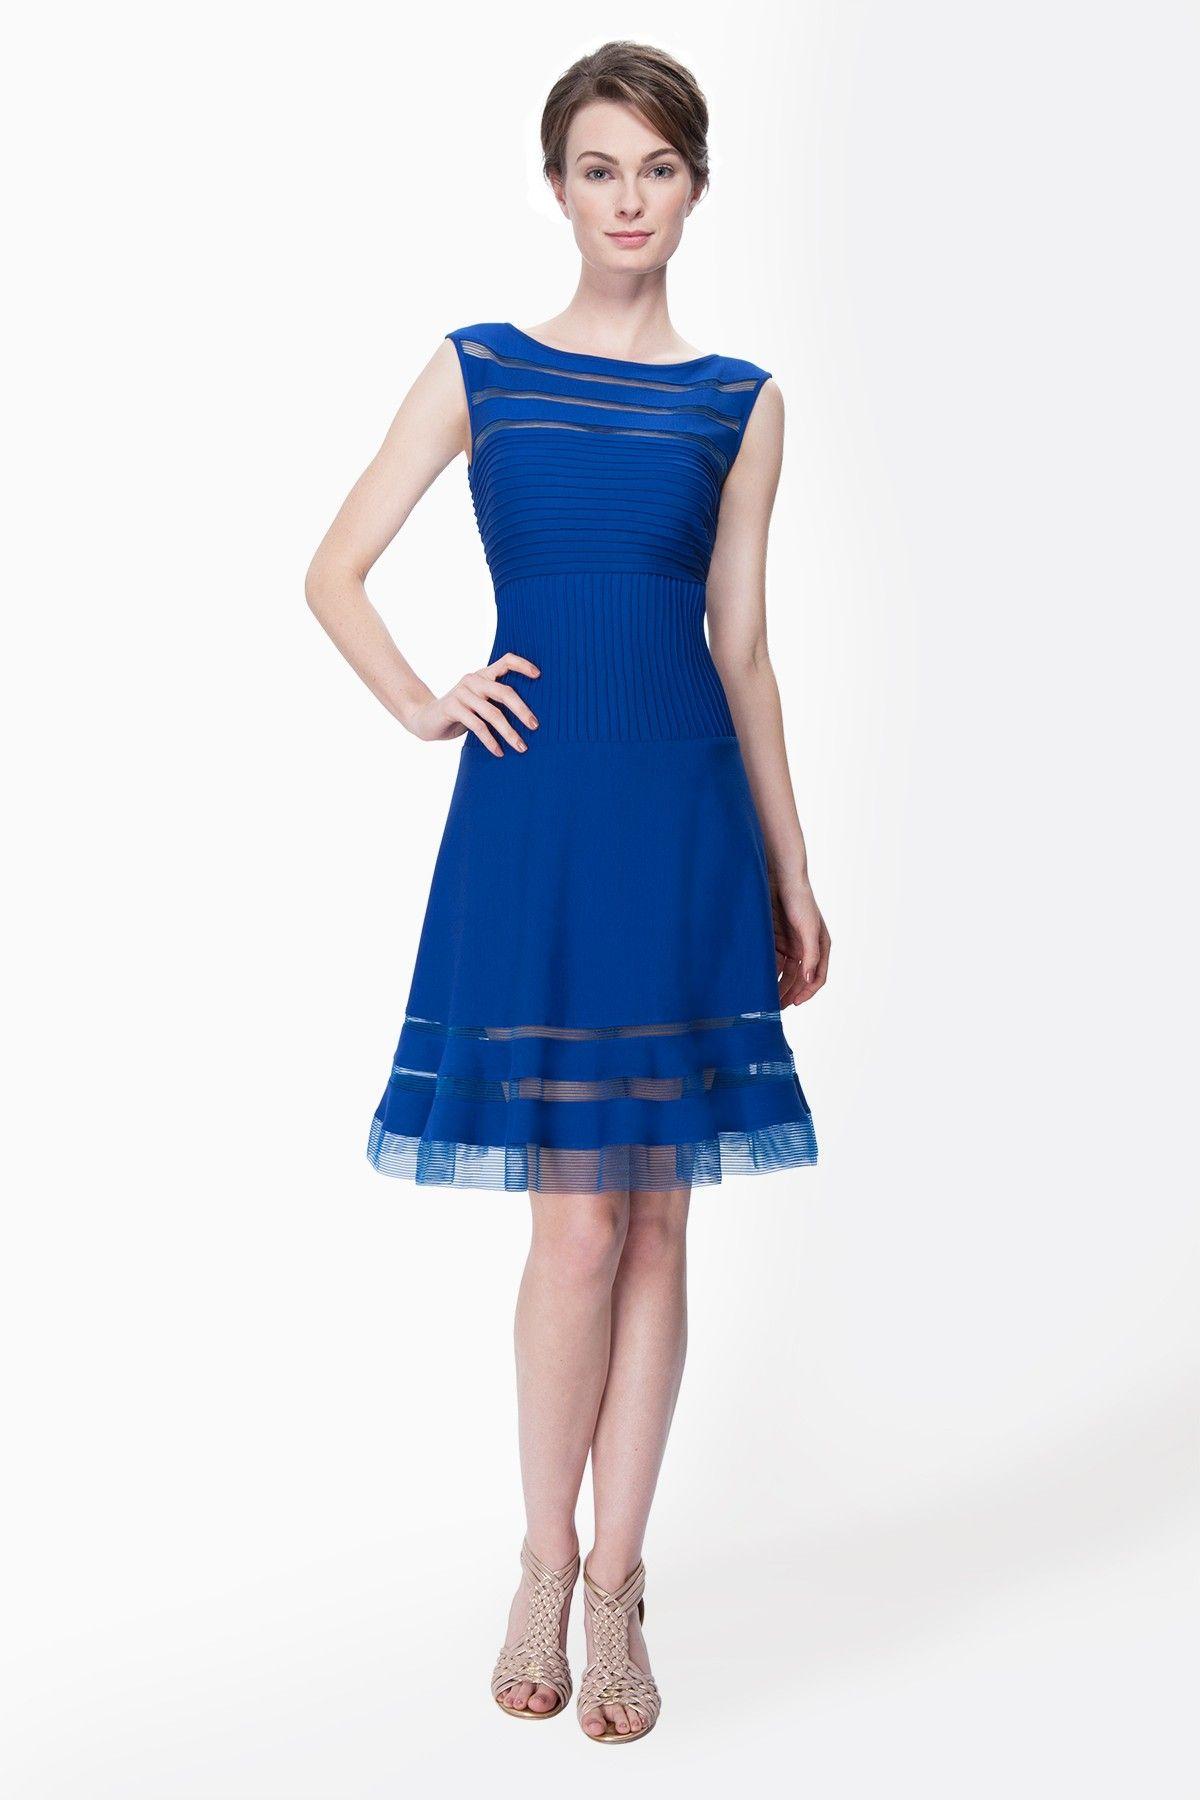 Cutout Jersey Boatneck Cocktail Dress In Blue Lagoon Shop Tadashi Shoji Navy Blue Lace Dress Pretty Blue Dress Dresses [ 1800 x 1200 Pixel ]